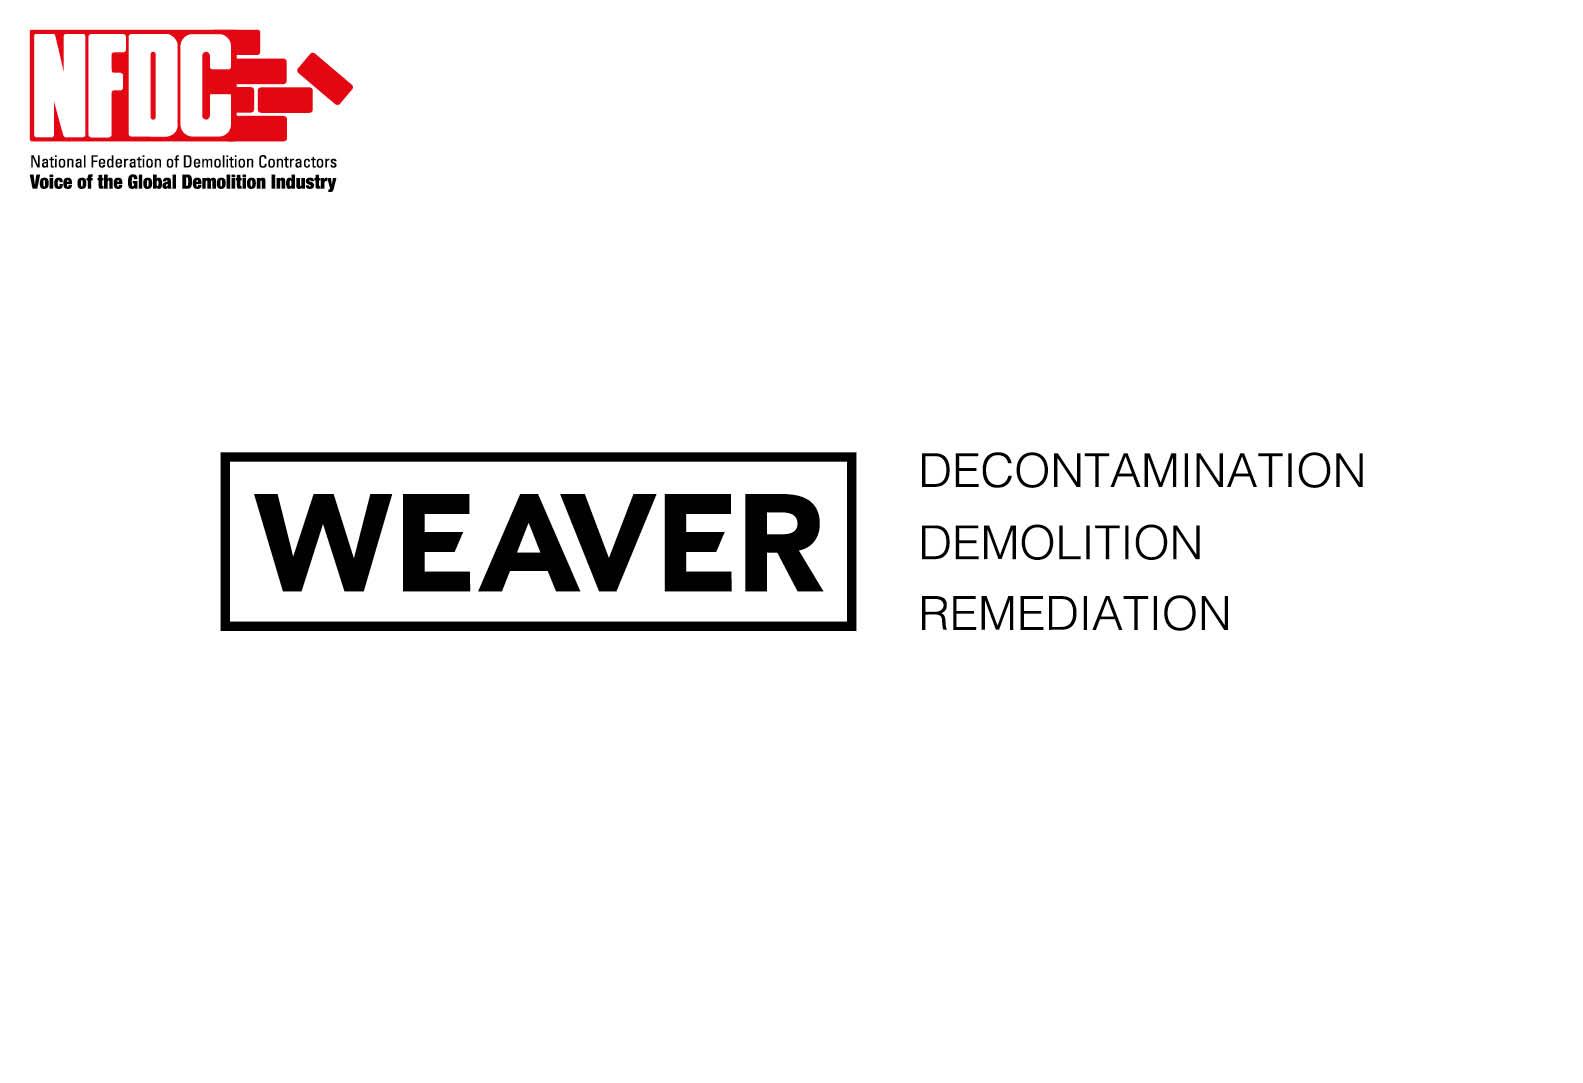 Weaver Demolition